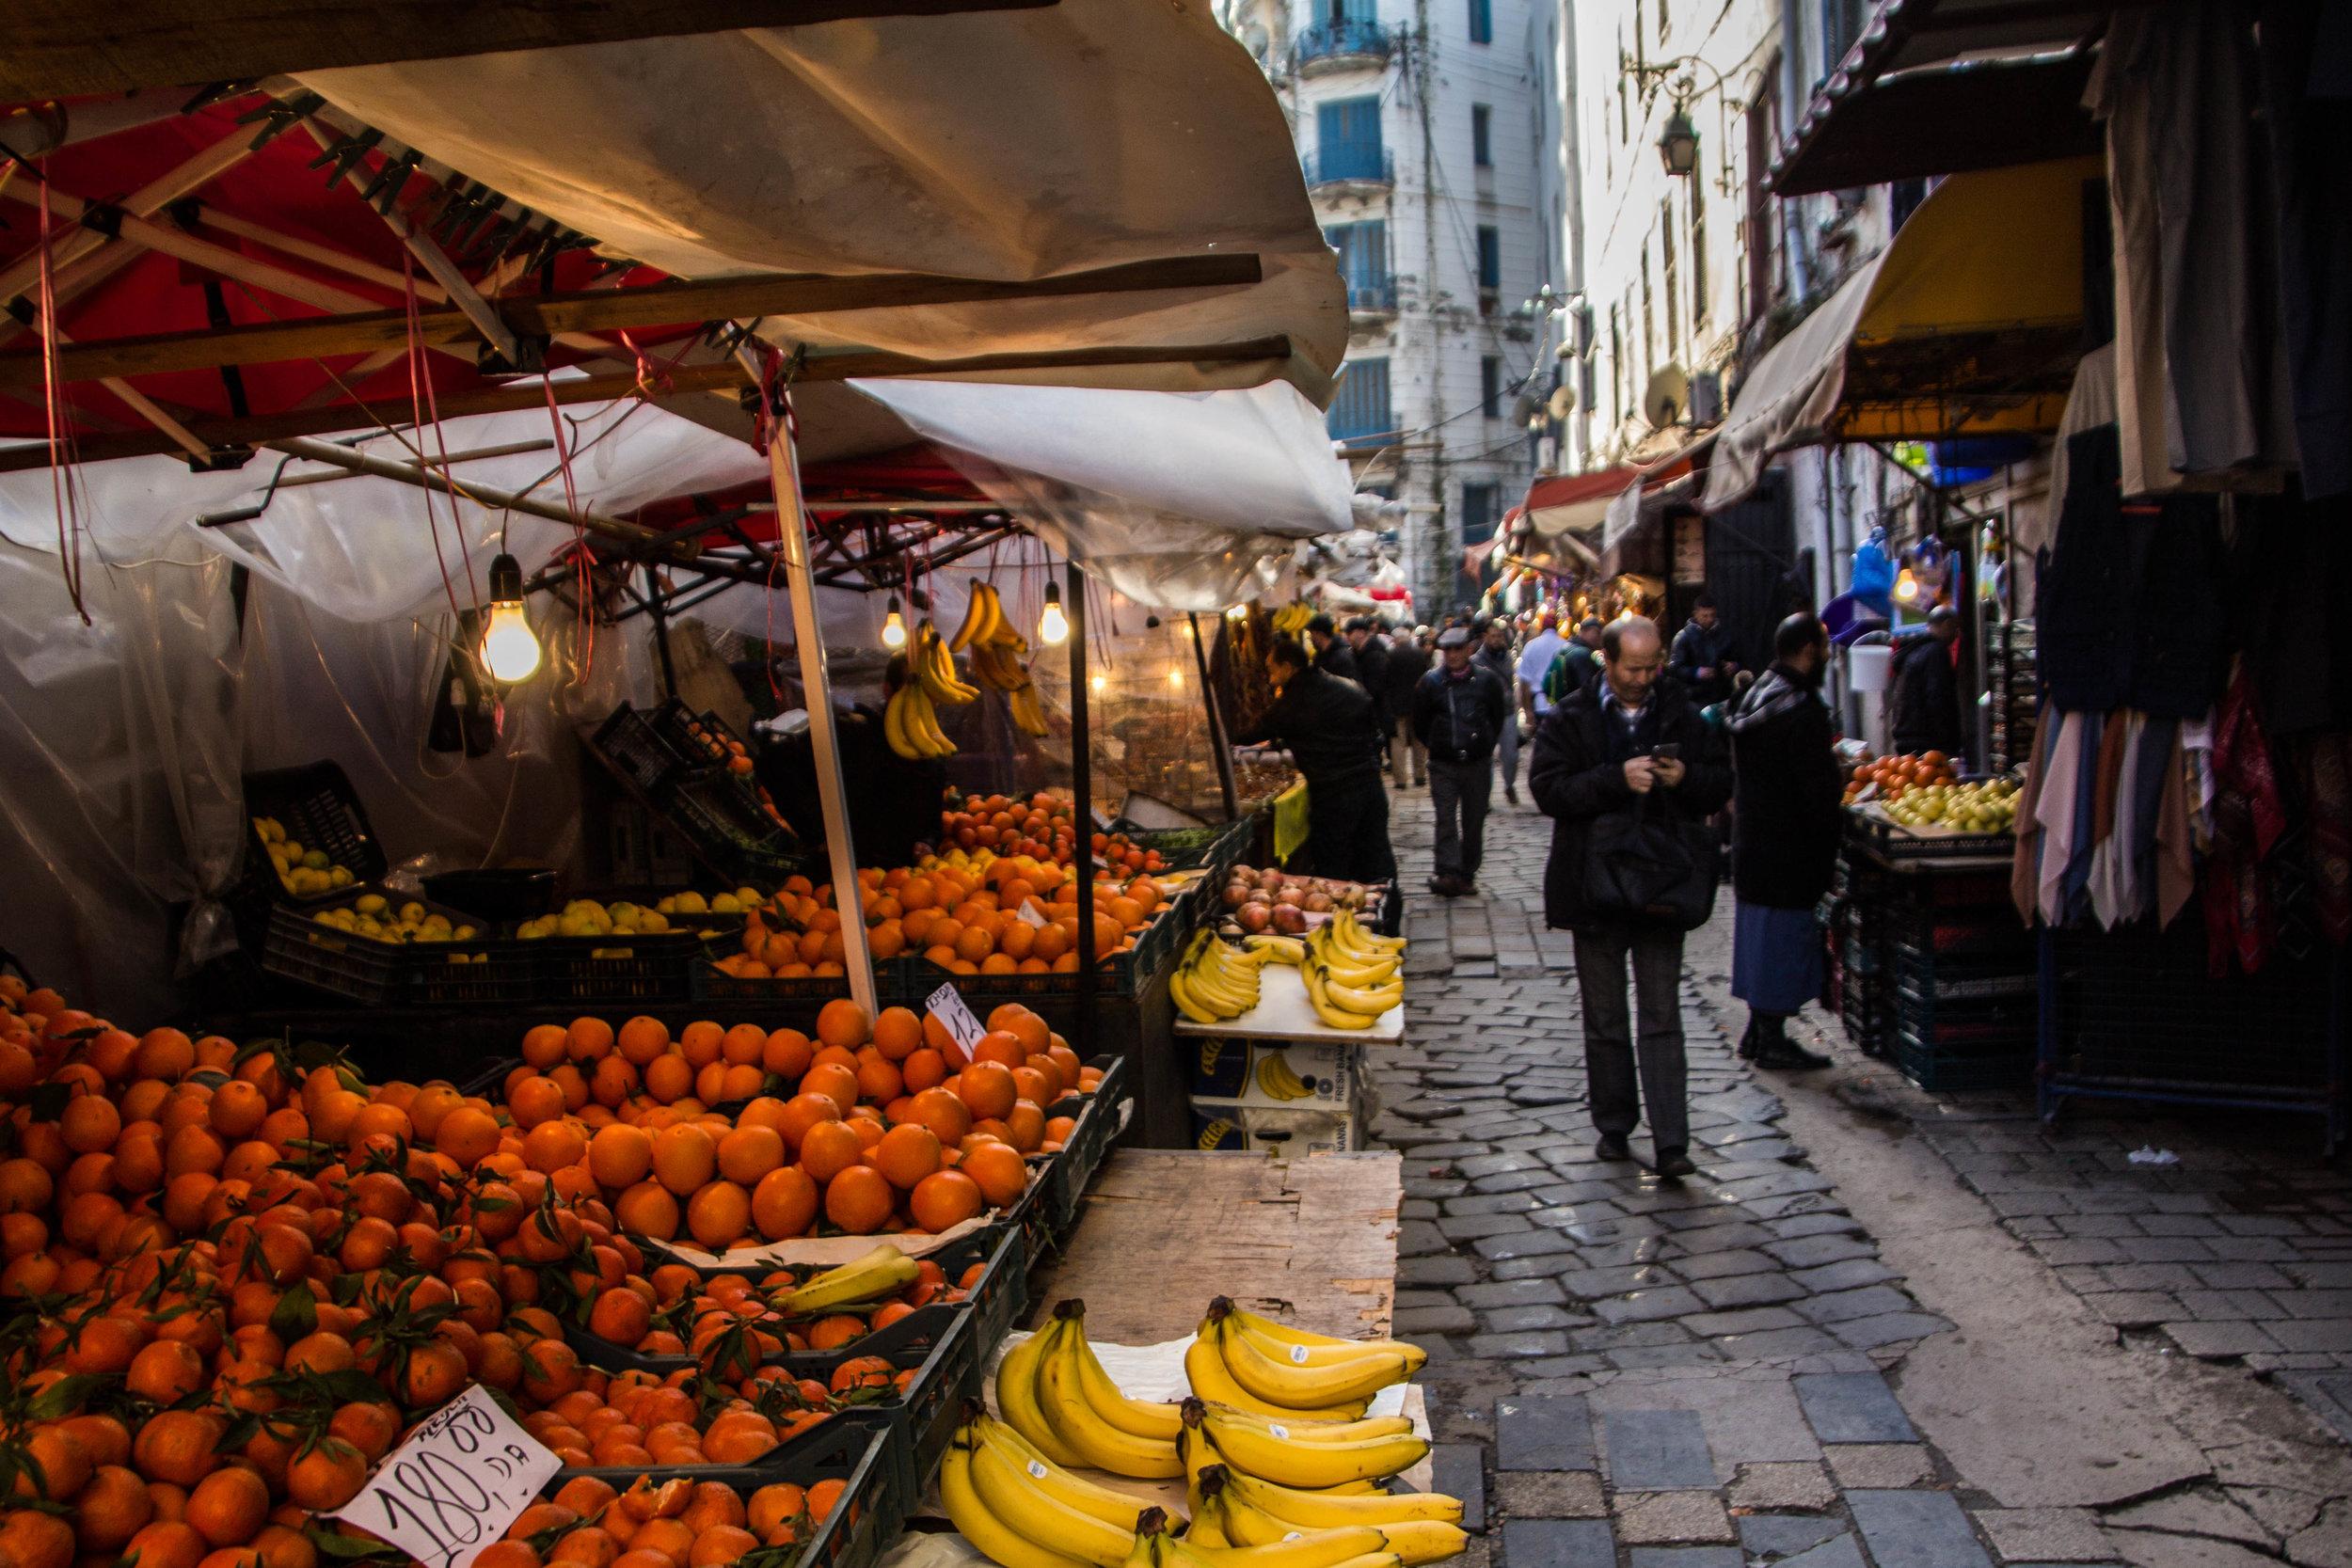 streets-algiers-algeria-3-2.jpg